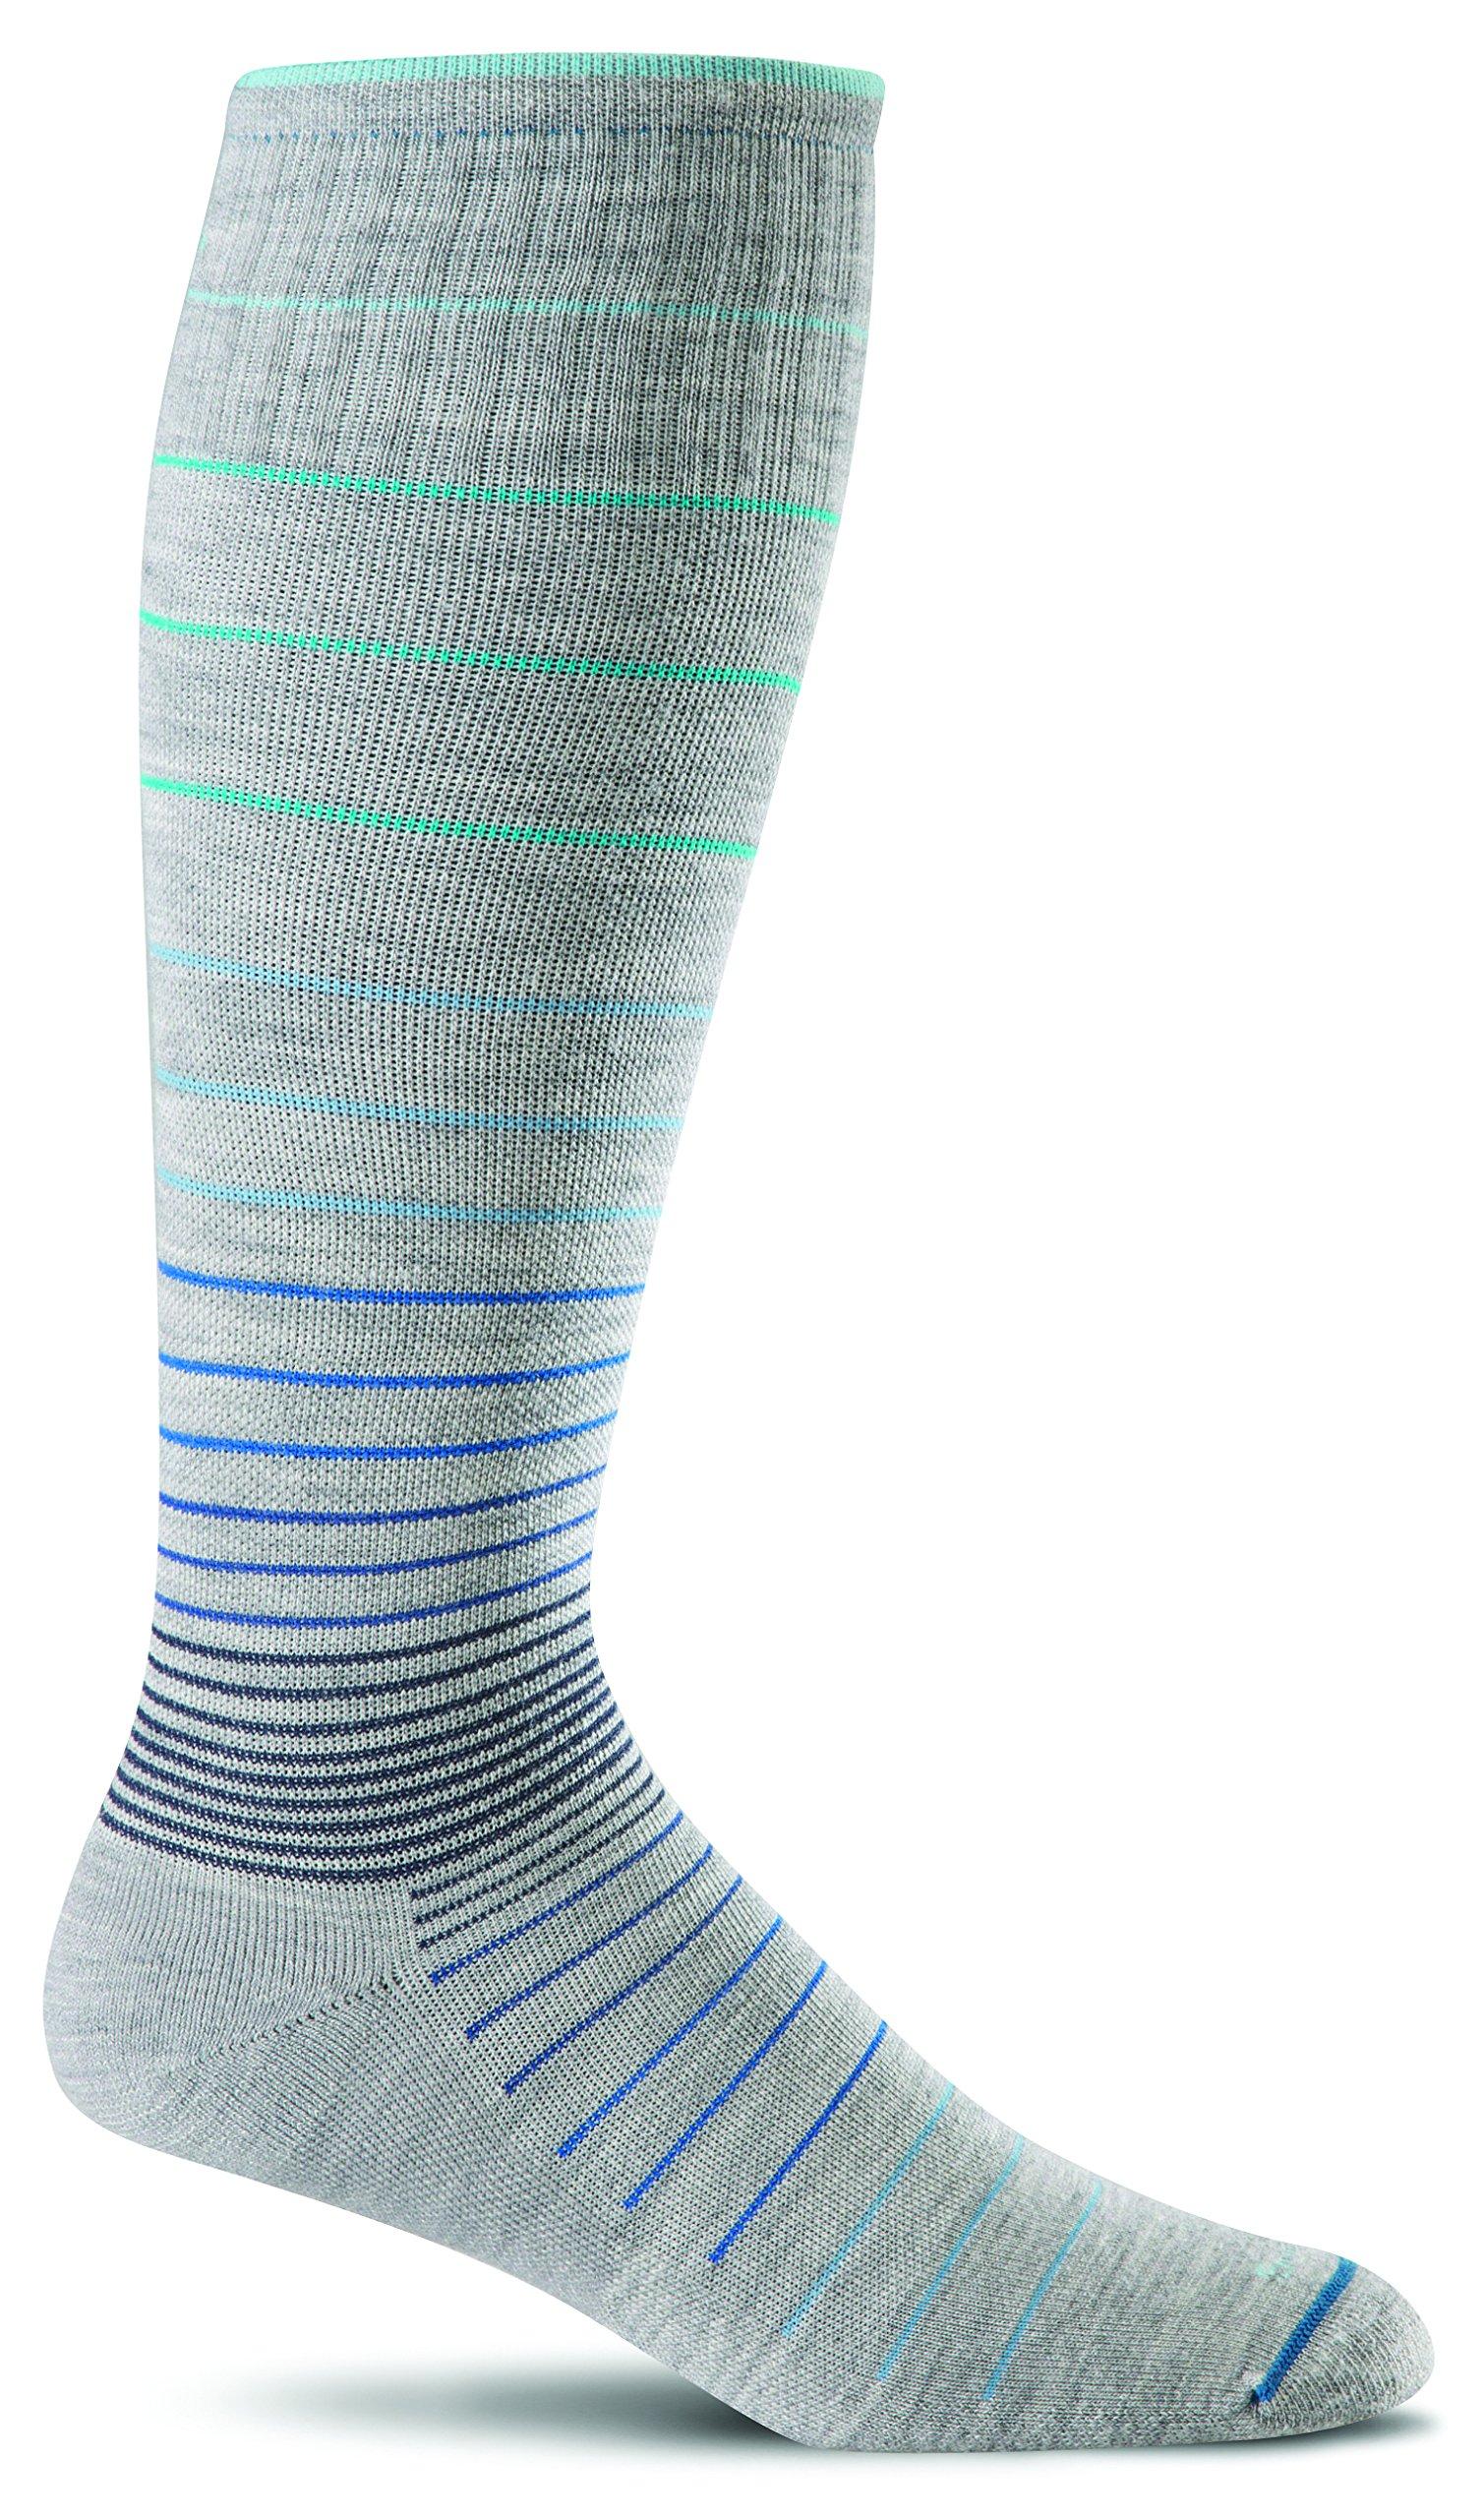 Sockwell Women's Circulator Graduated Compression Socks, Small/Medium (4-7.5) Grey